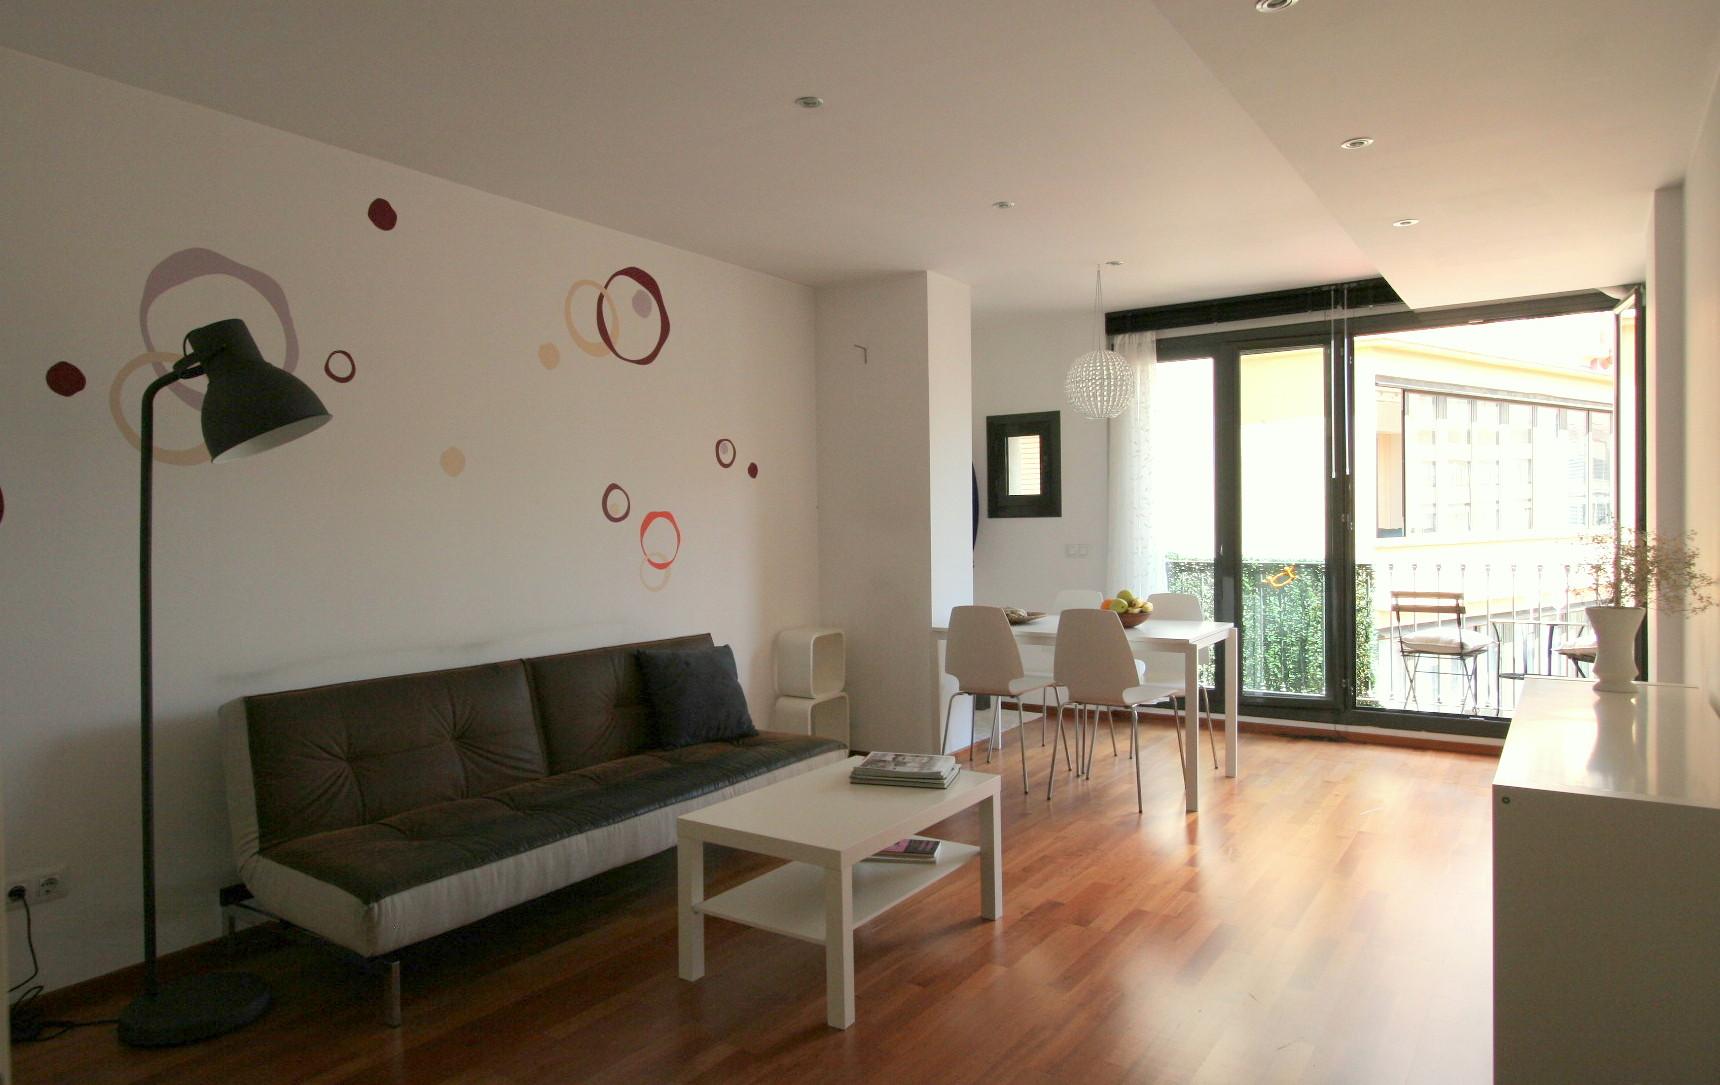 EasyApartmentRental  Charming 2 bedroom apartment near Plaza Catalunya